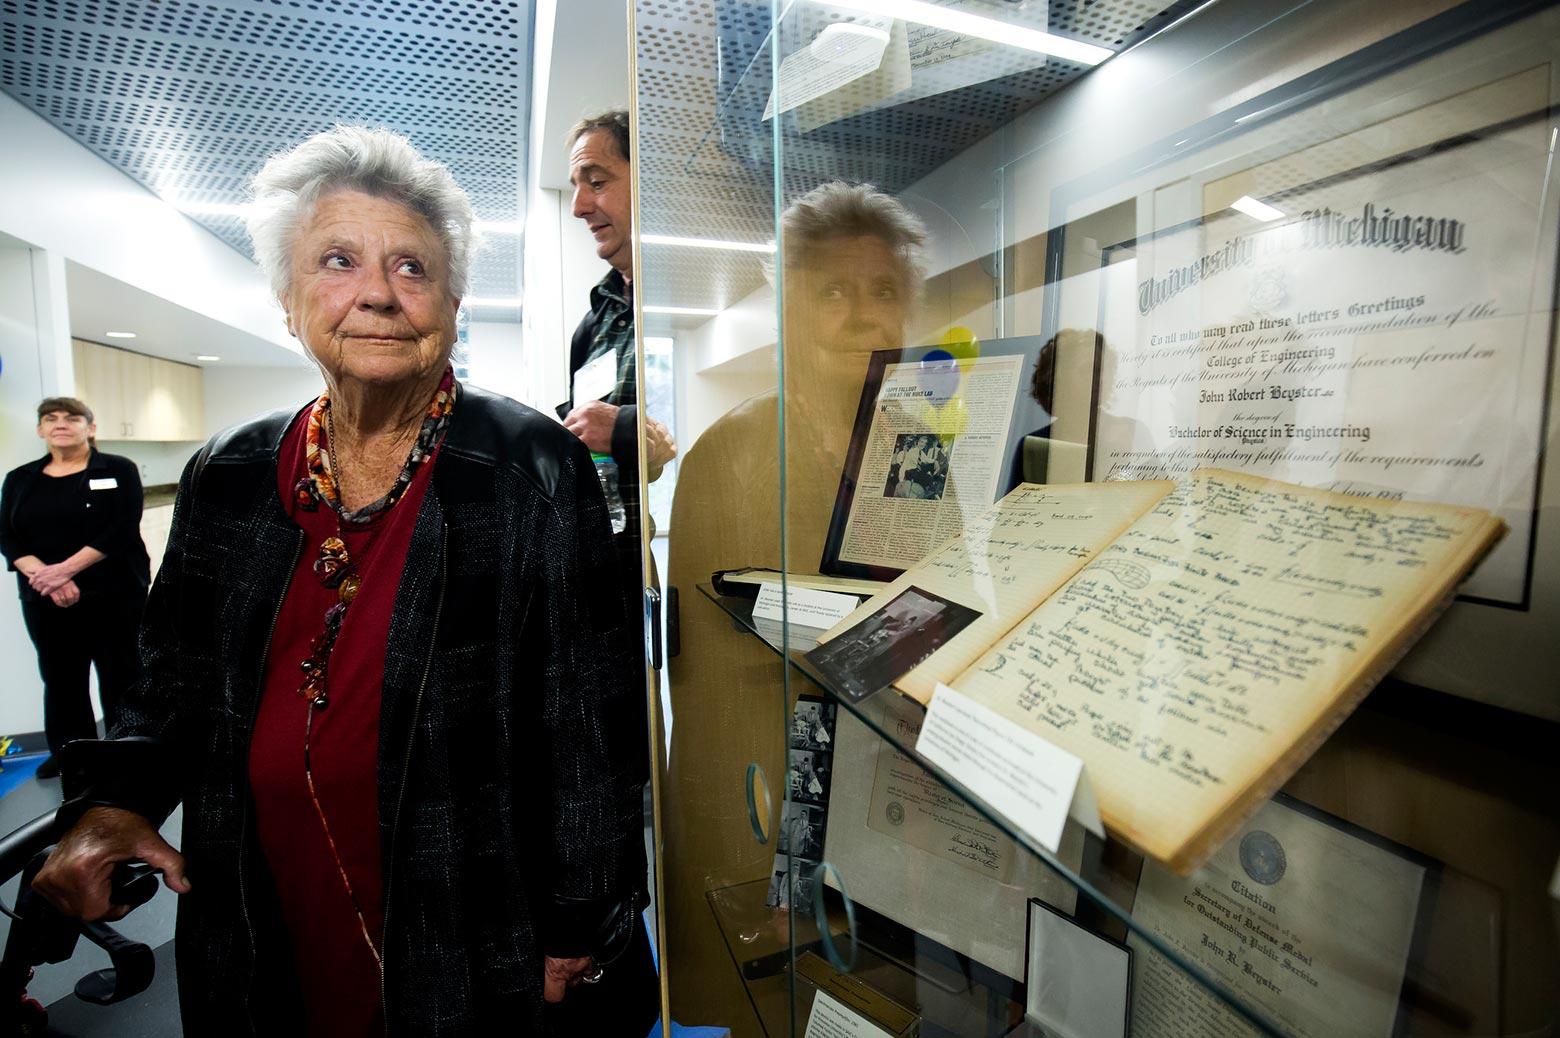 Betty Beyster views a showcase